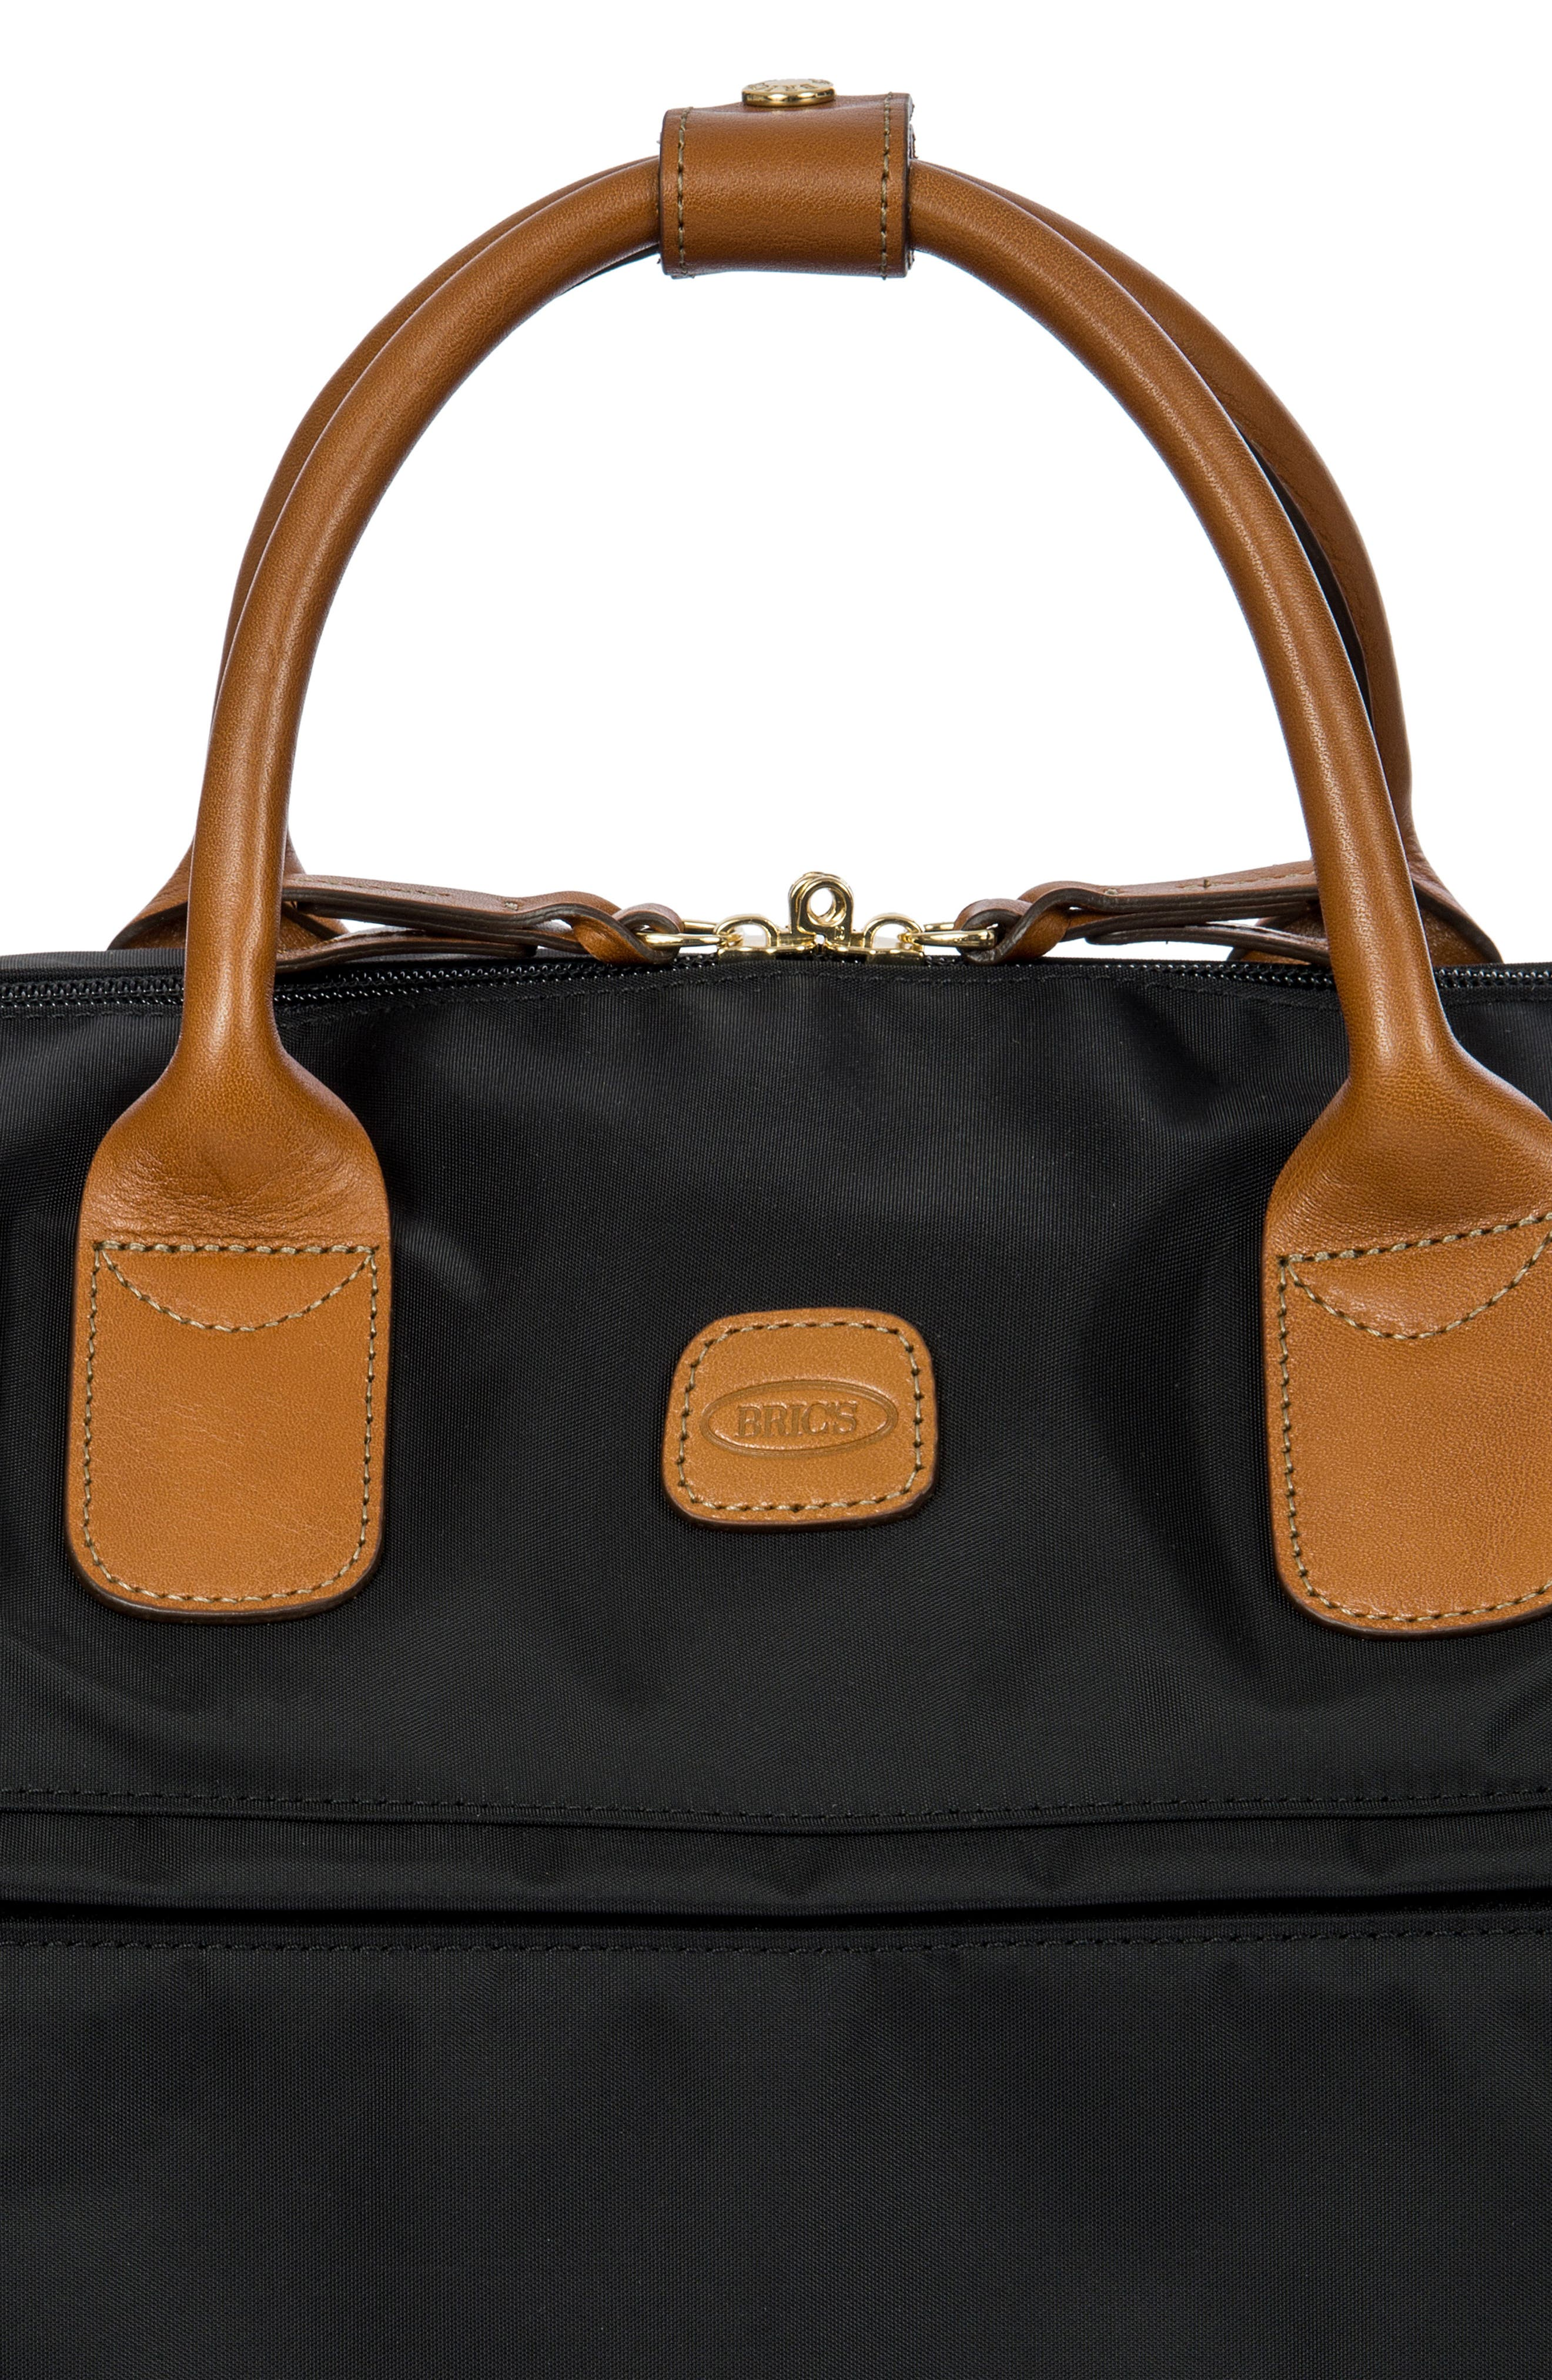 X-Bag Boarding 22-Inch Duffel Bag,                             Alternate thumbnail 5, color,                             BLACK